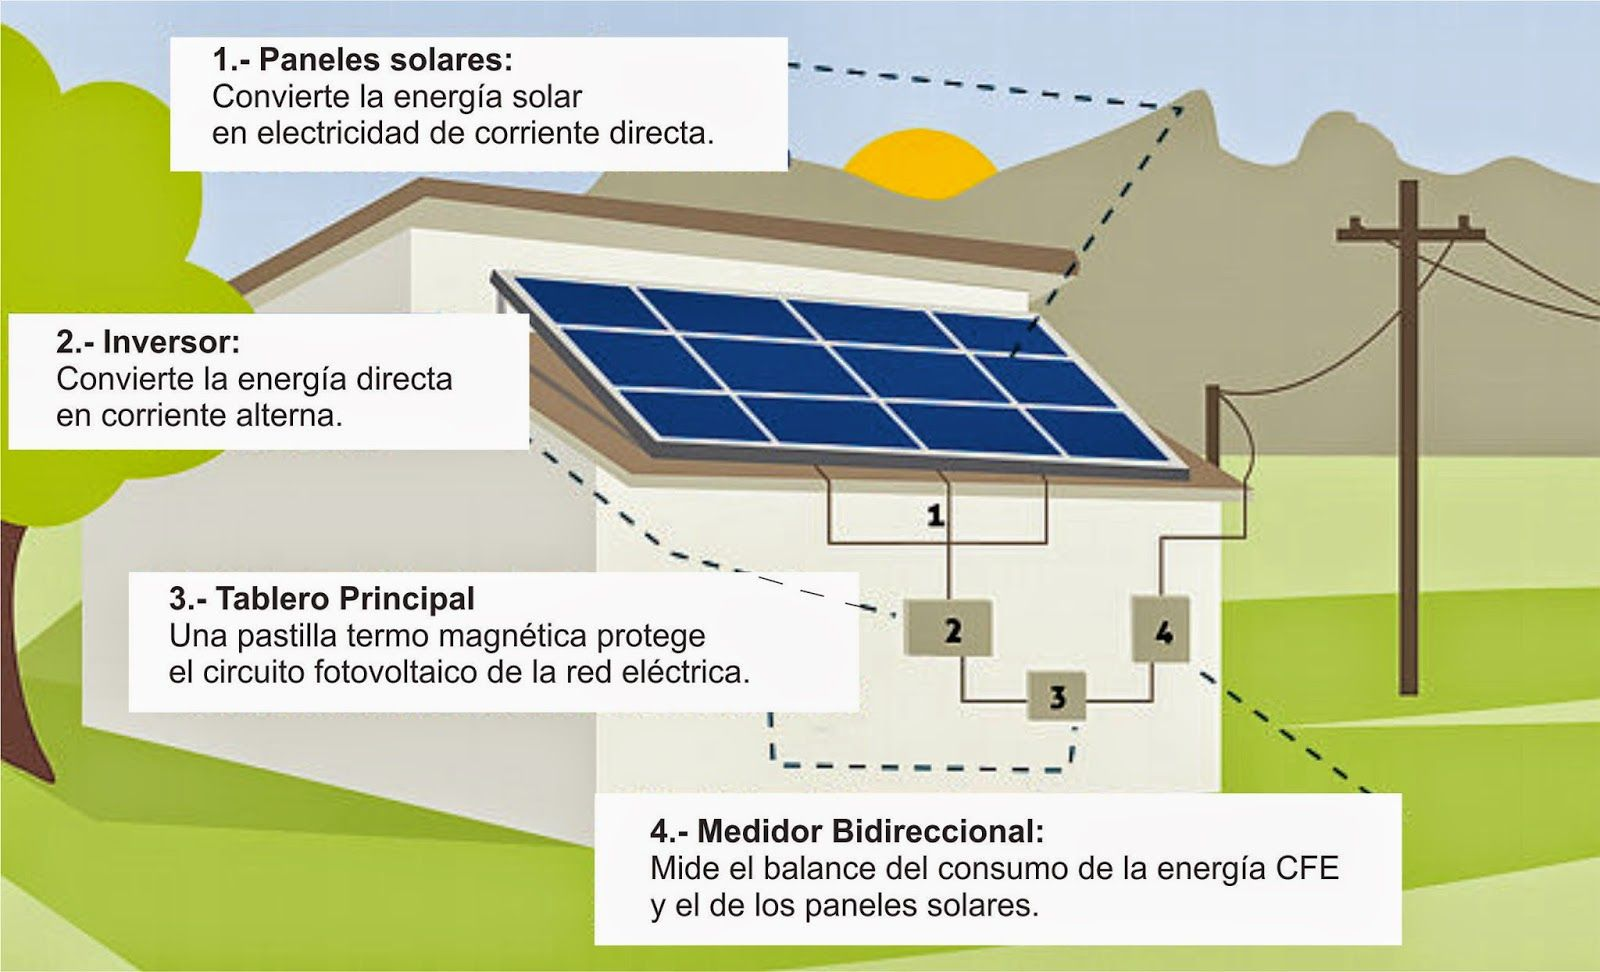 Paneles Solares en Casa … Energía solar, Paneles solares